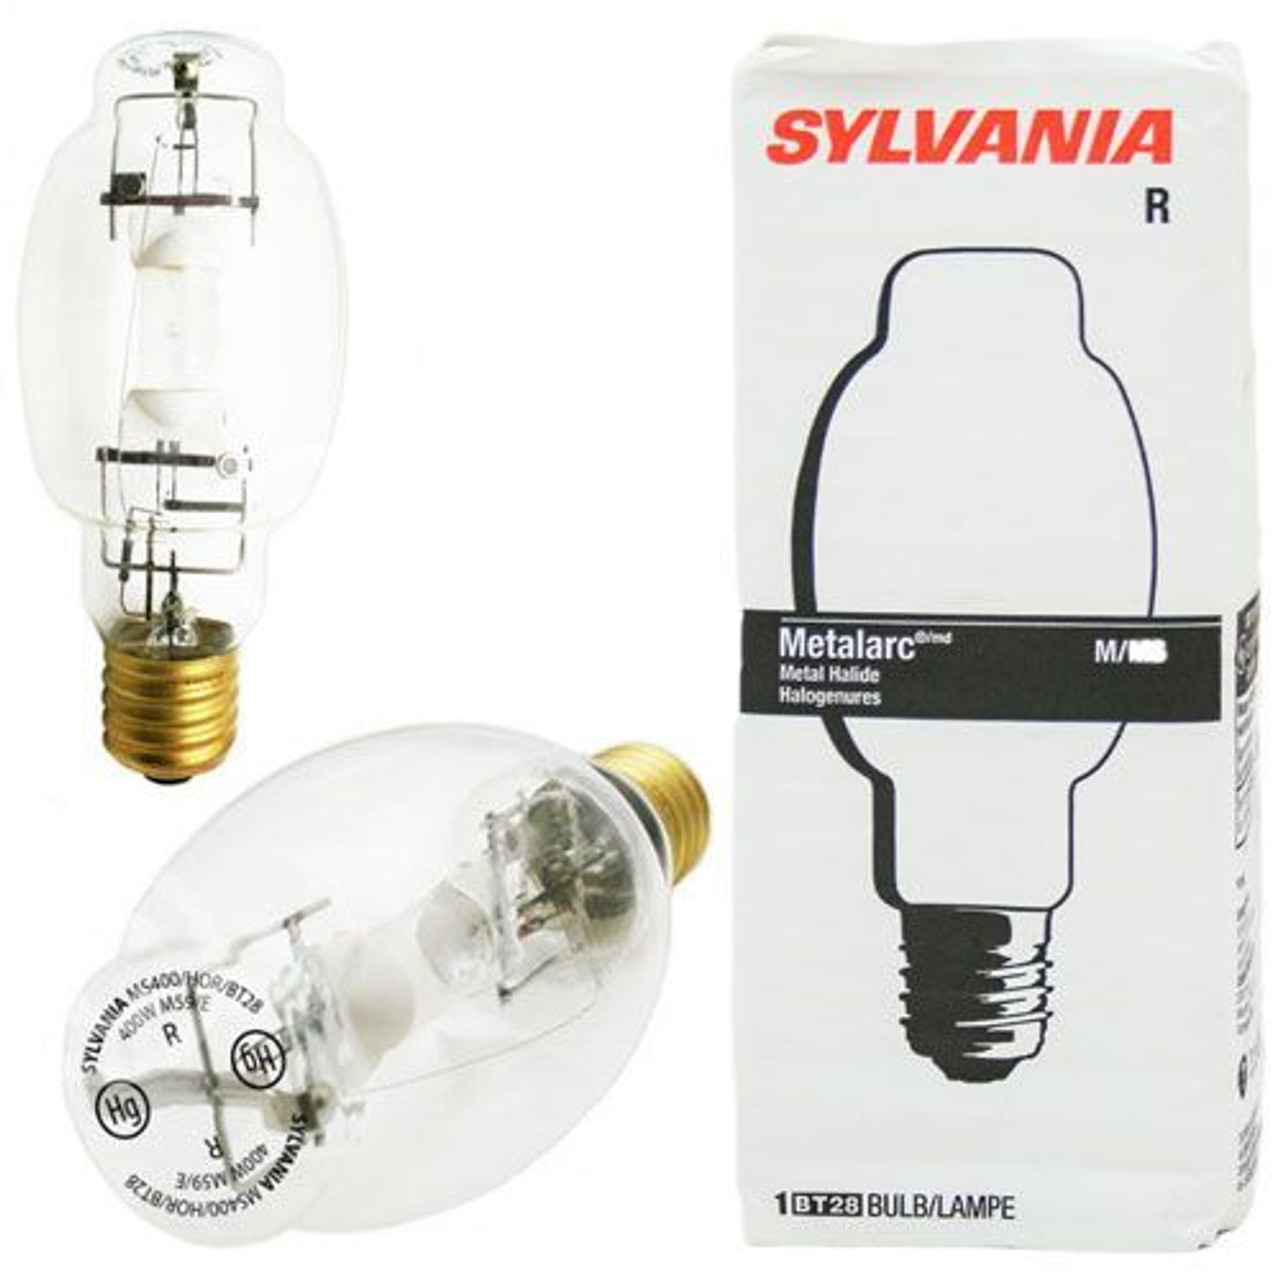 SYLVANIA METALARC METAL HALIDE 400 WATT BULB M59//E M400//U//BT28 NEW SINGLE